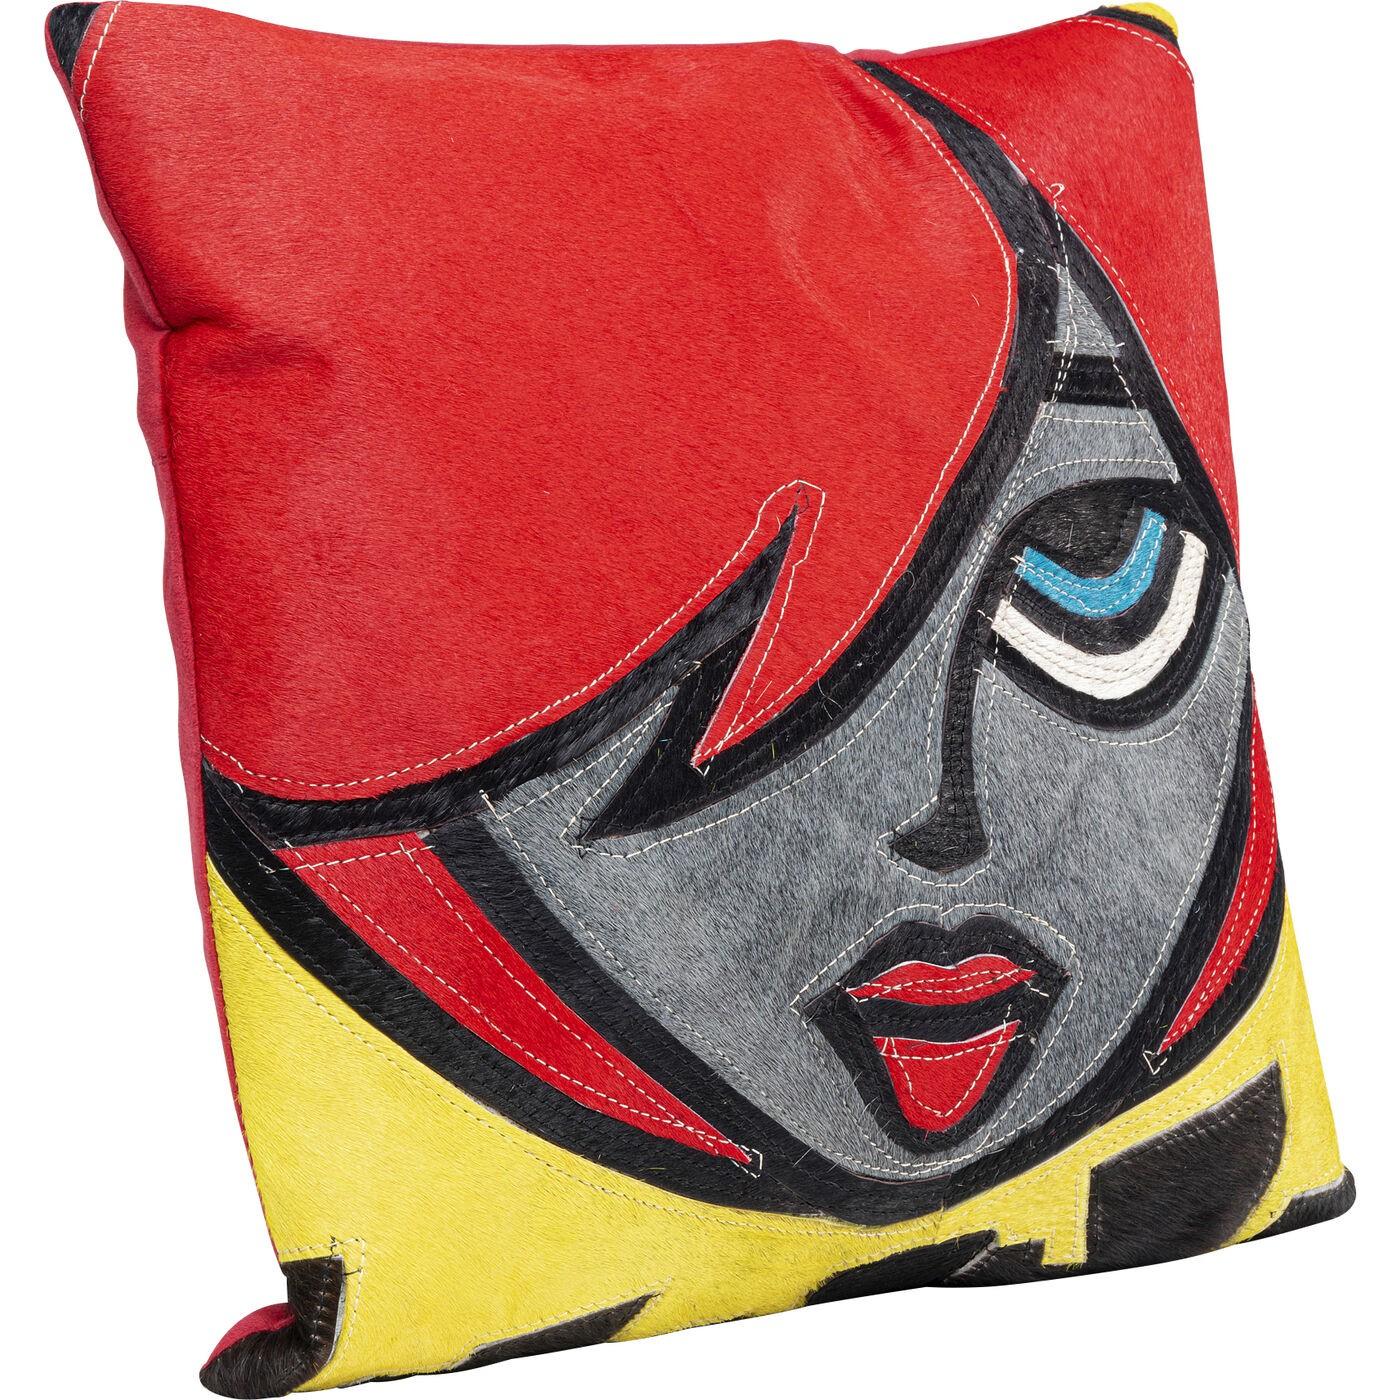 Coussin femme cheveux rouges courts Kare Design